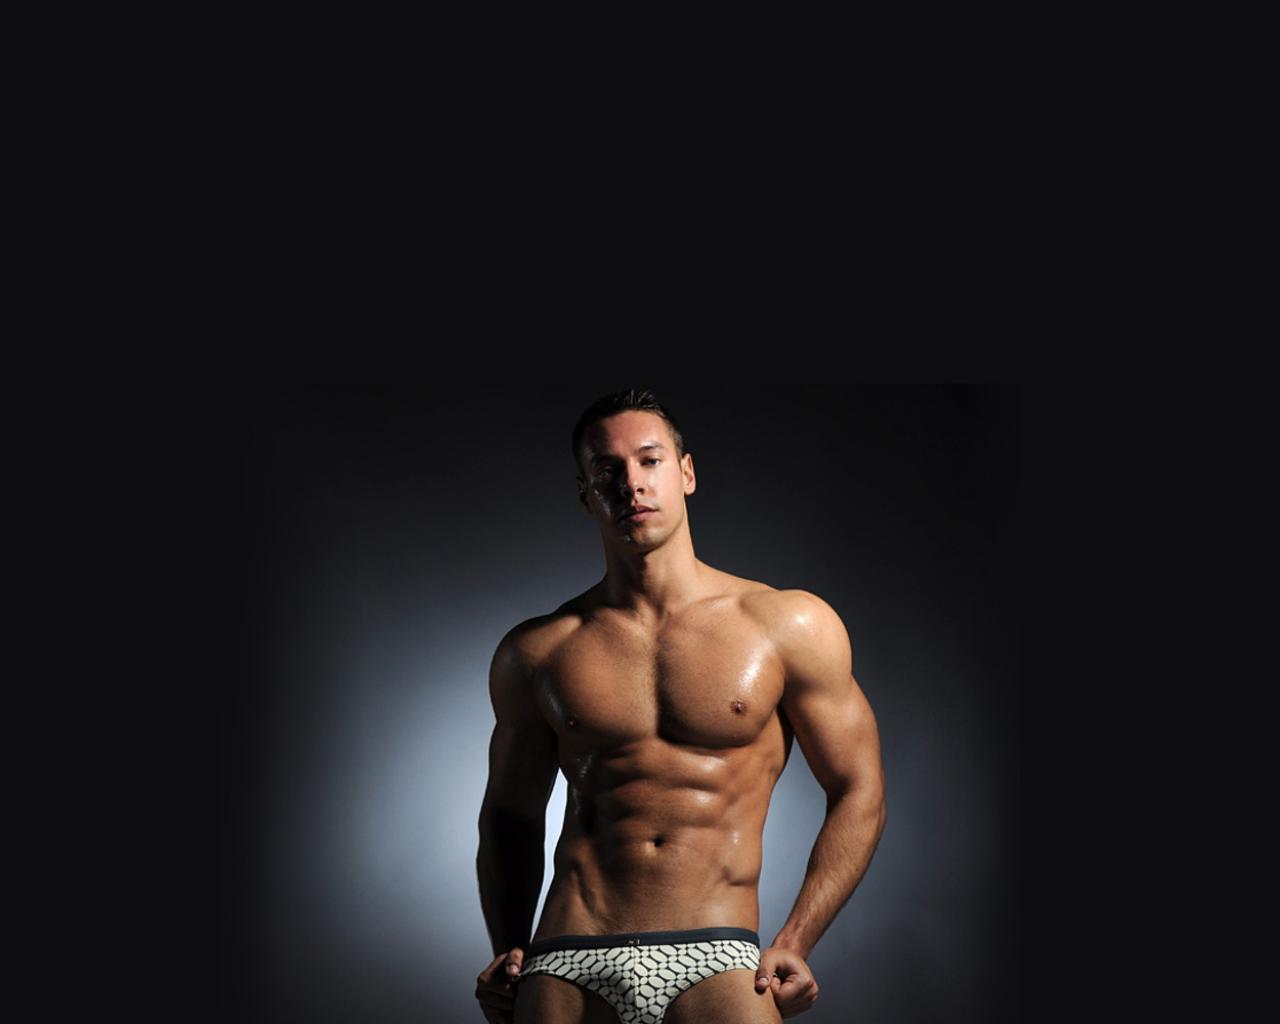 Фото мускулистьх мужиков 3